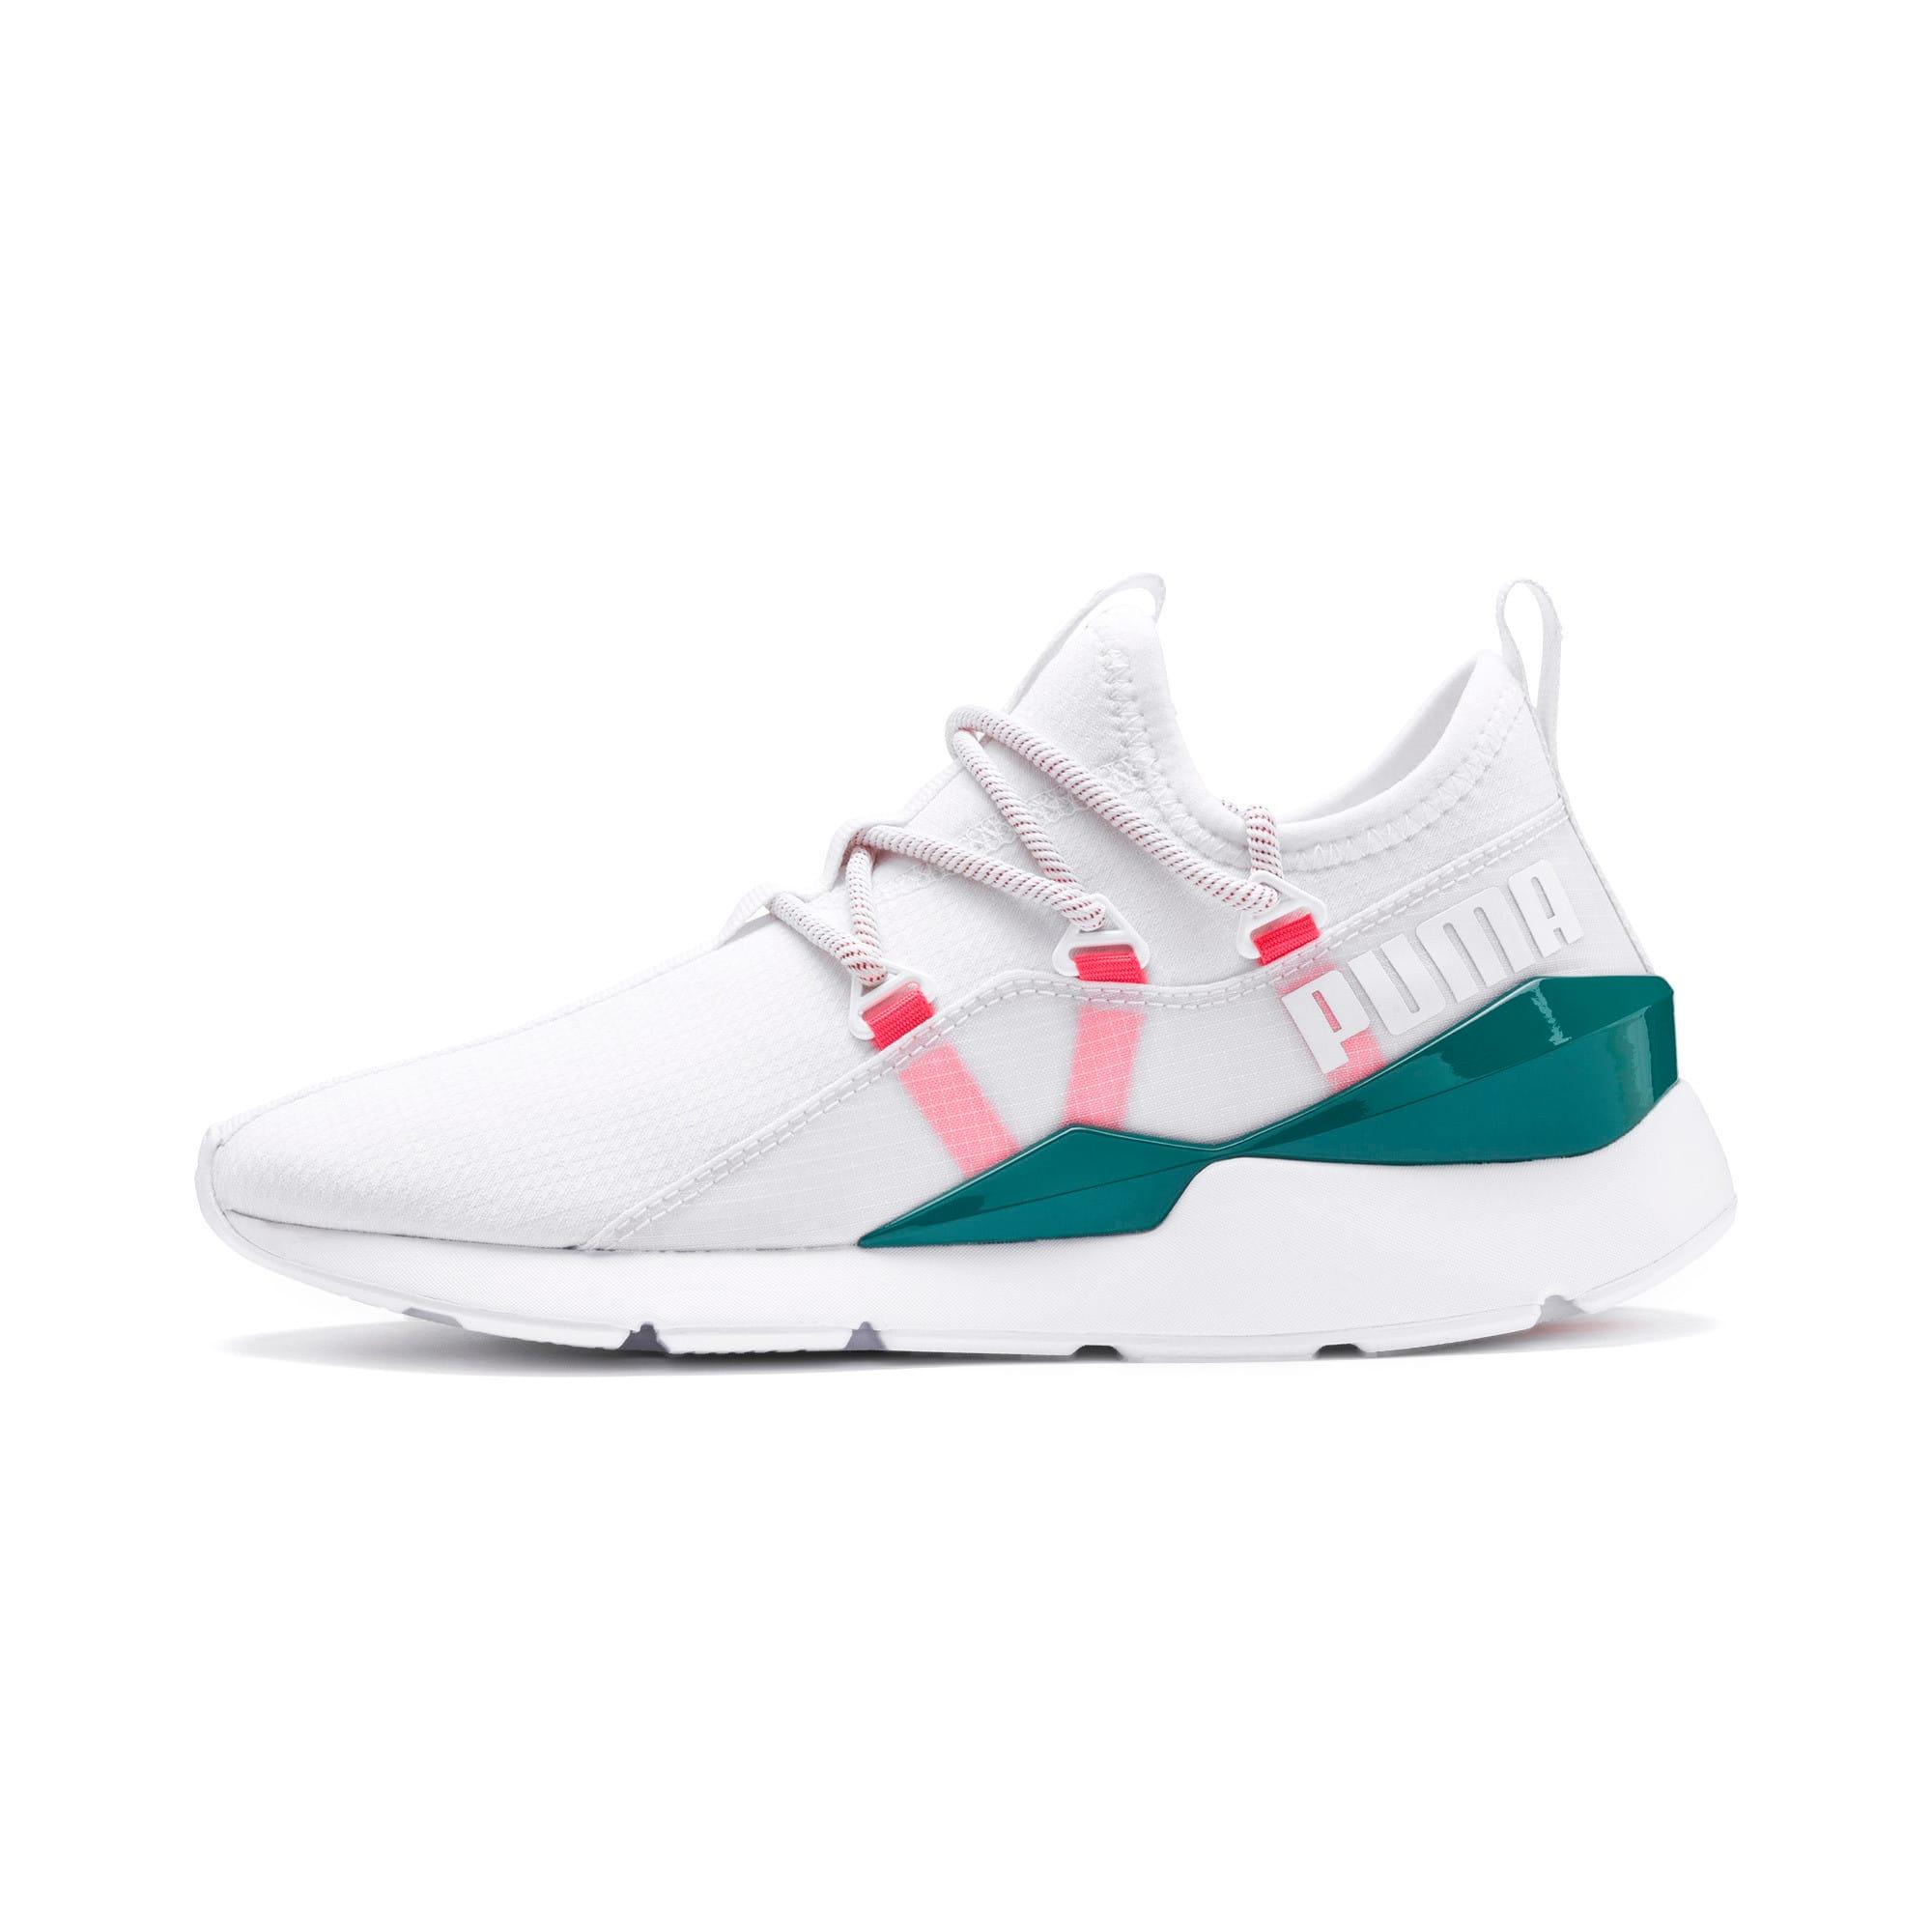 Thumbnail 1 of Muse 2 Hypertech Women's Sneakers, Puma White-Pink Alert, medium